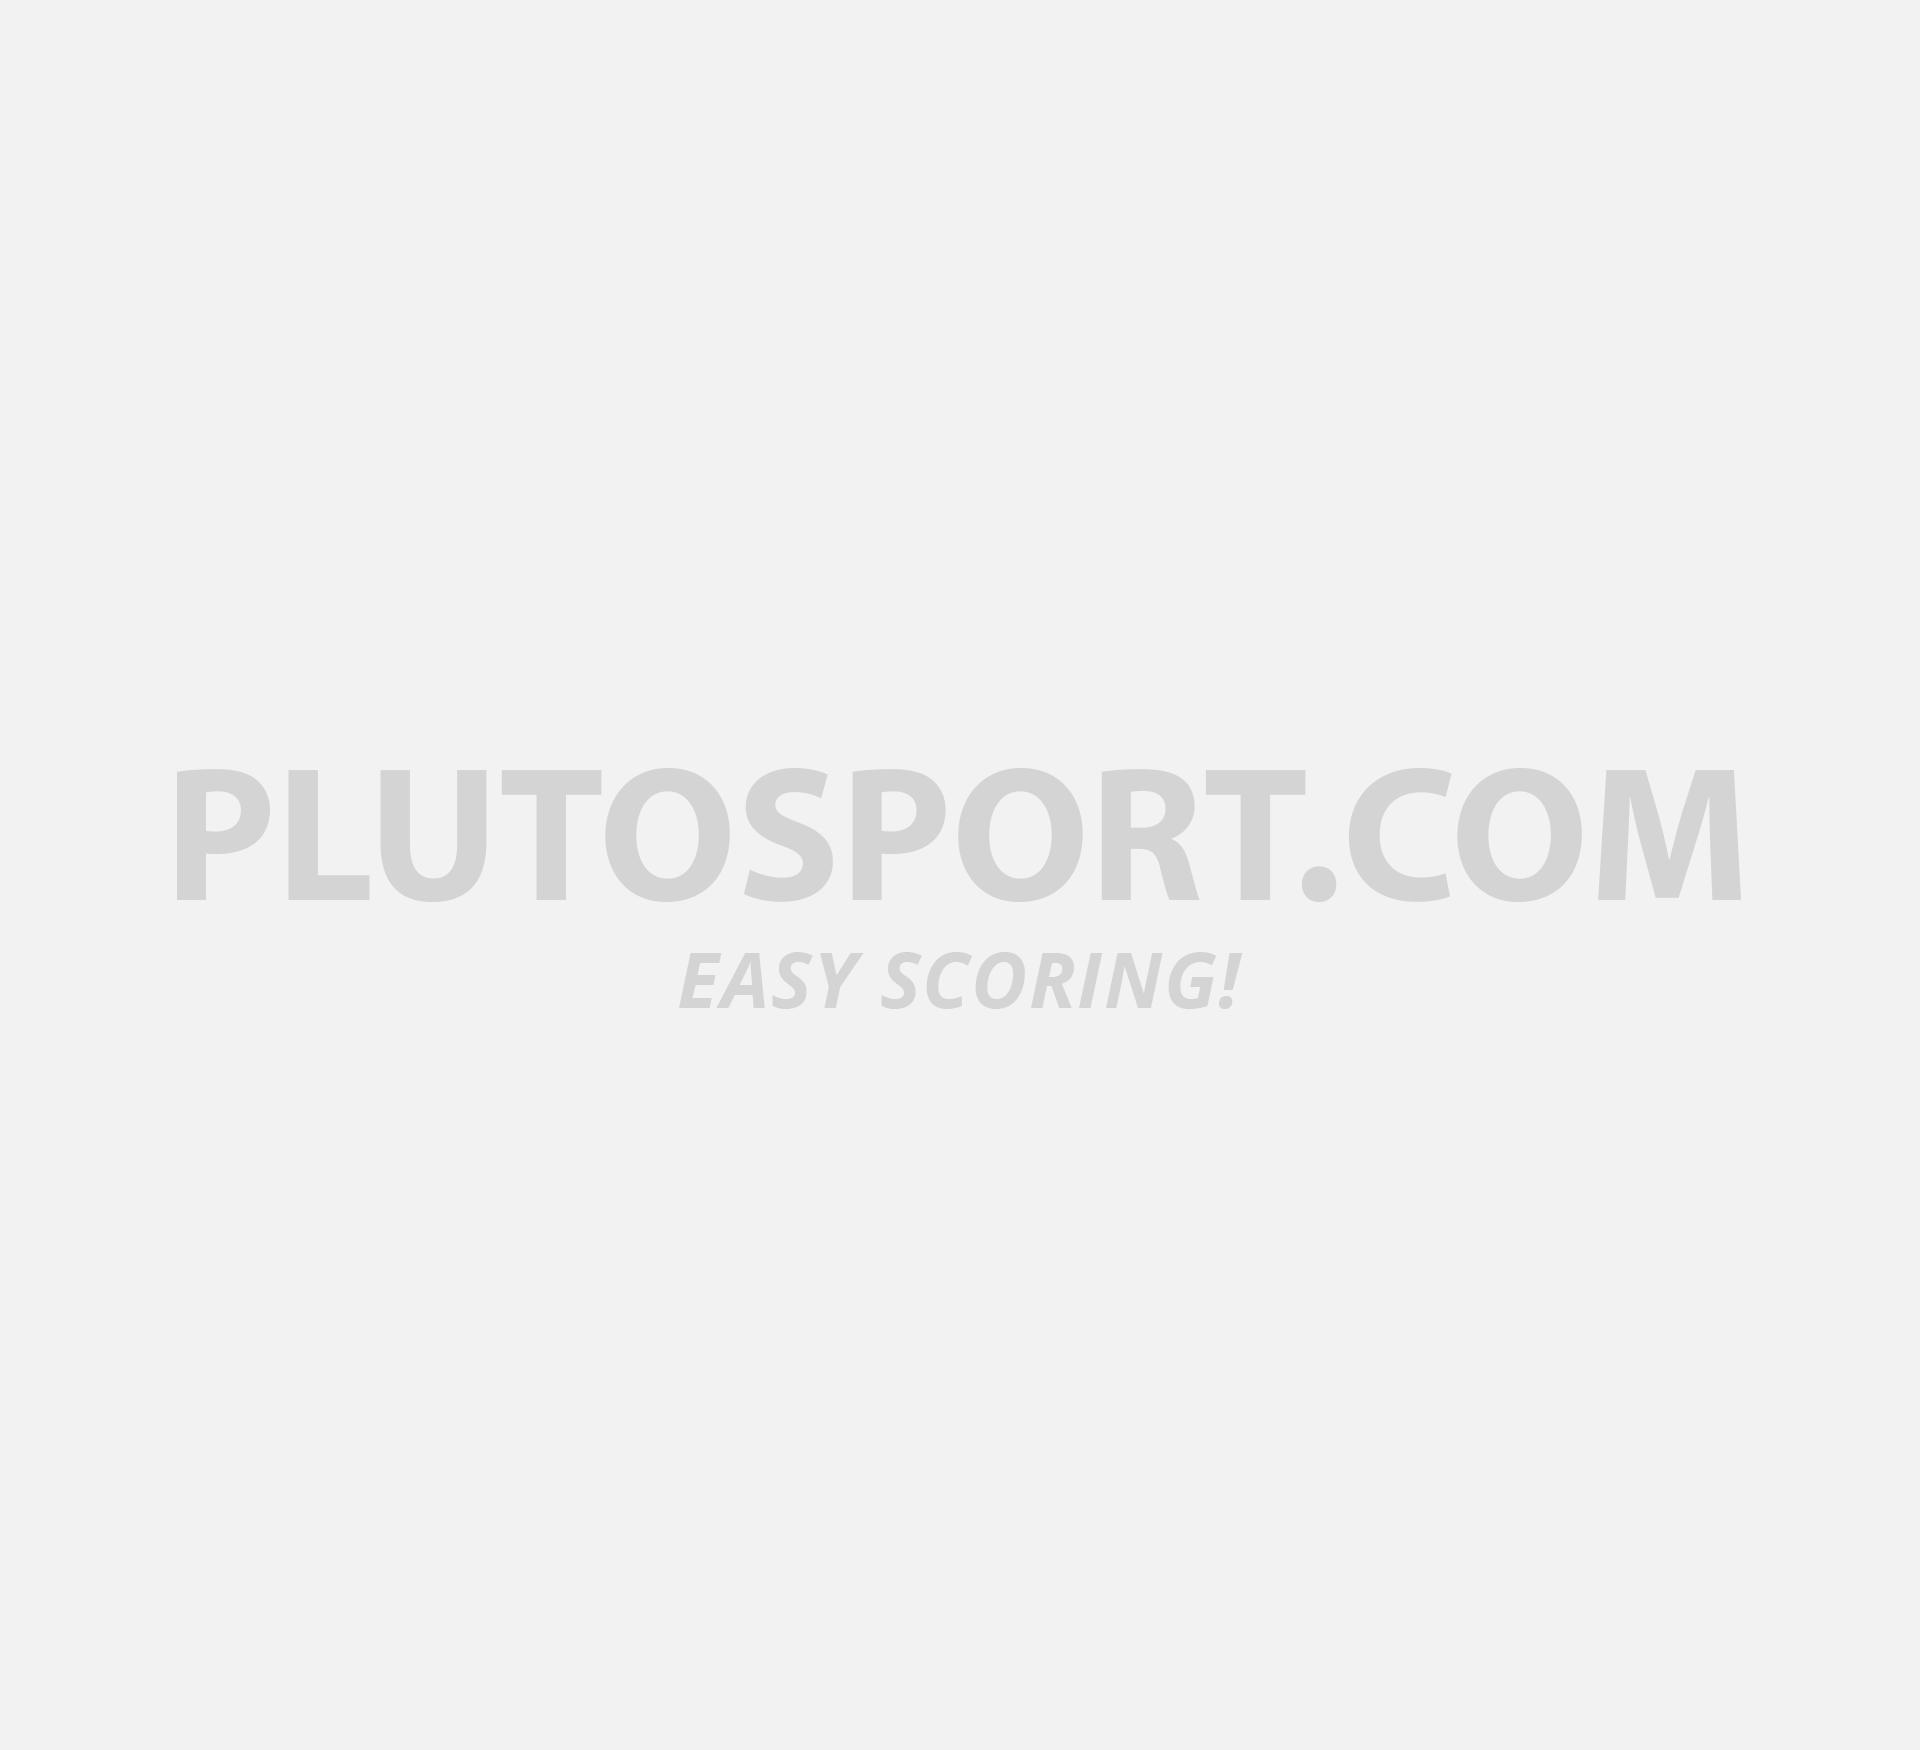 010fead062 Nike Hypervenom Phelon III FG - Boots fixed stud - Shoes - Football -  Sports | Plutosport